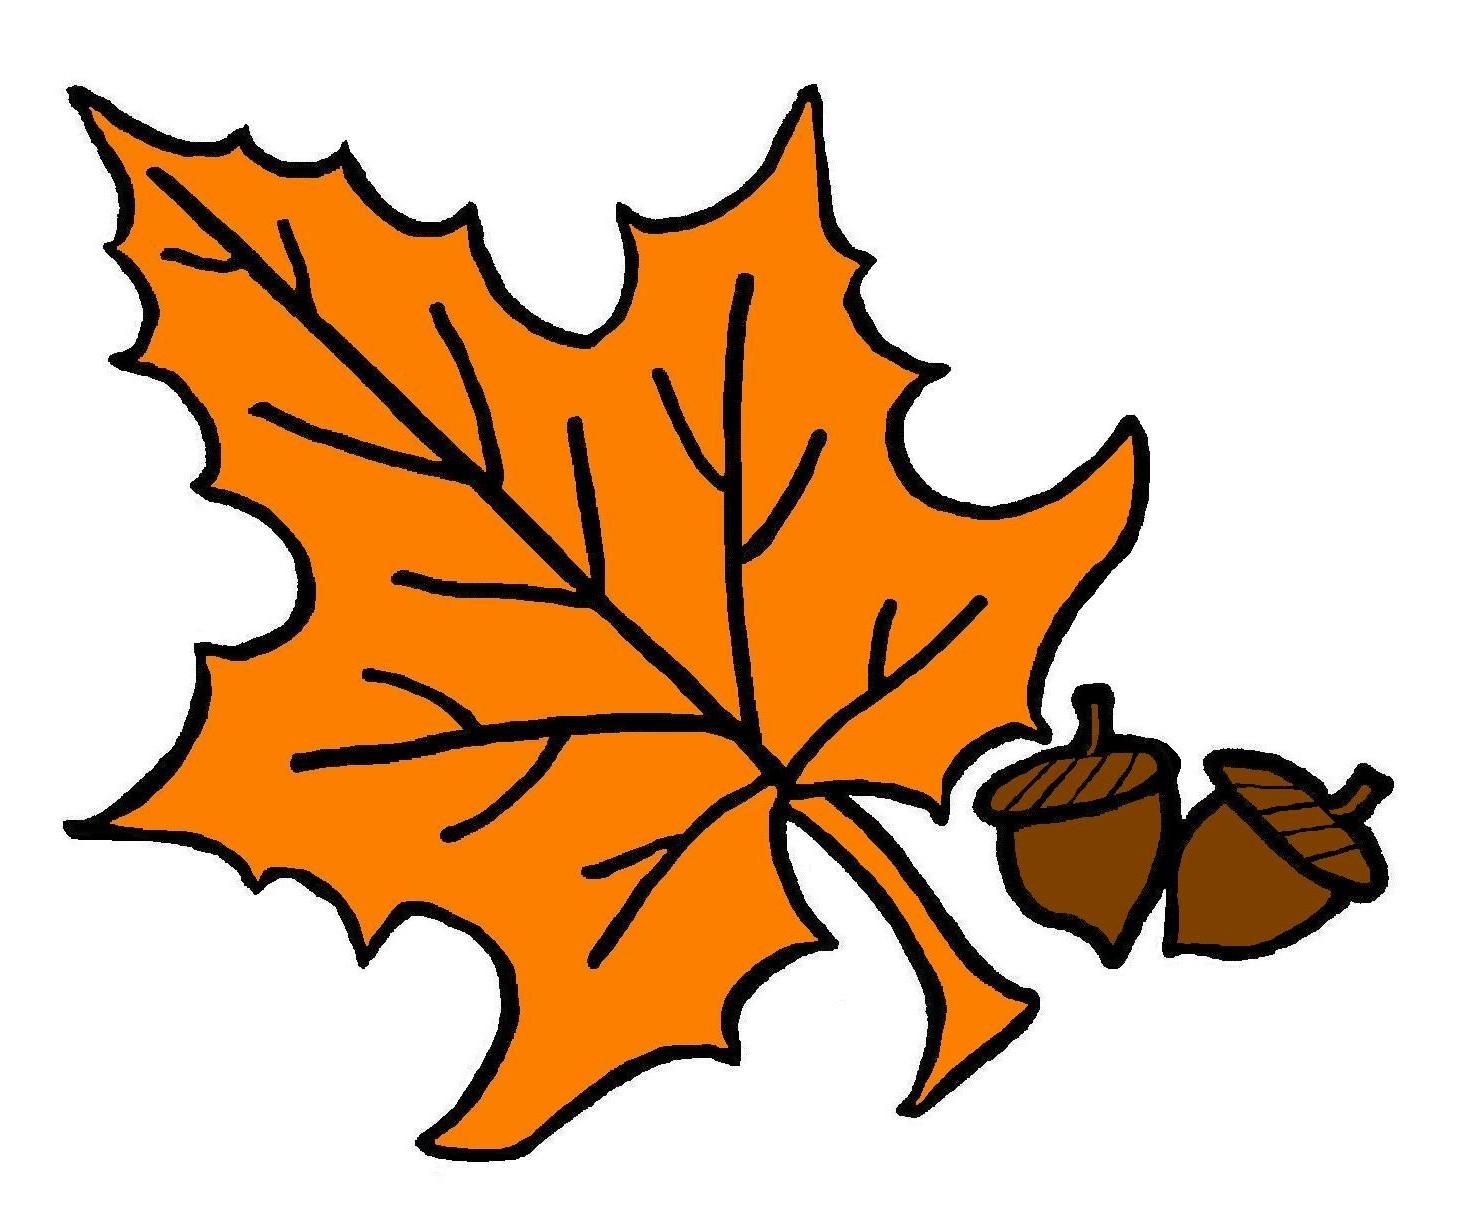 Fall Leaves Clip Art Free-Fall leaves clip art free-5